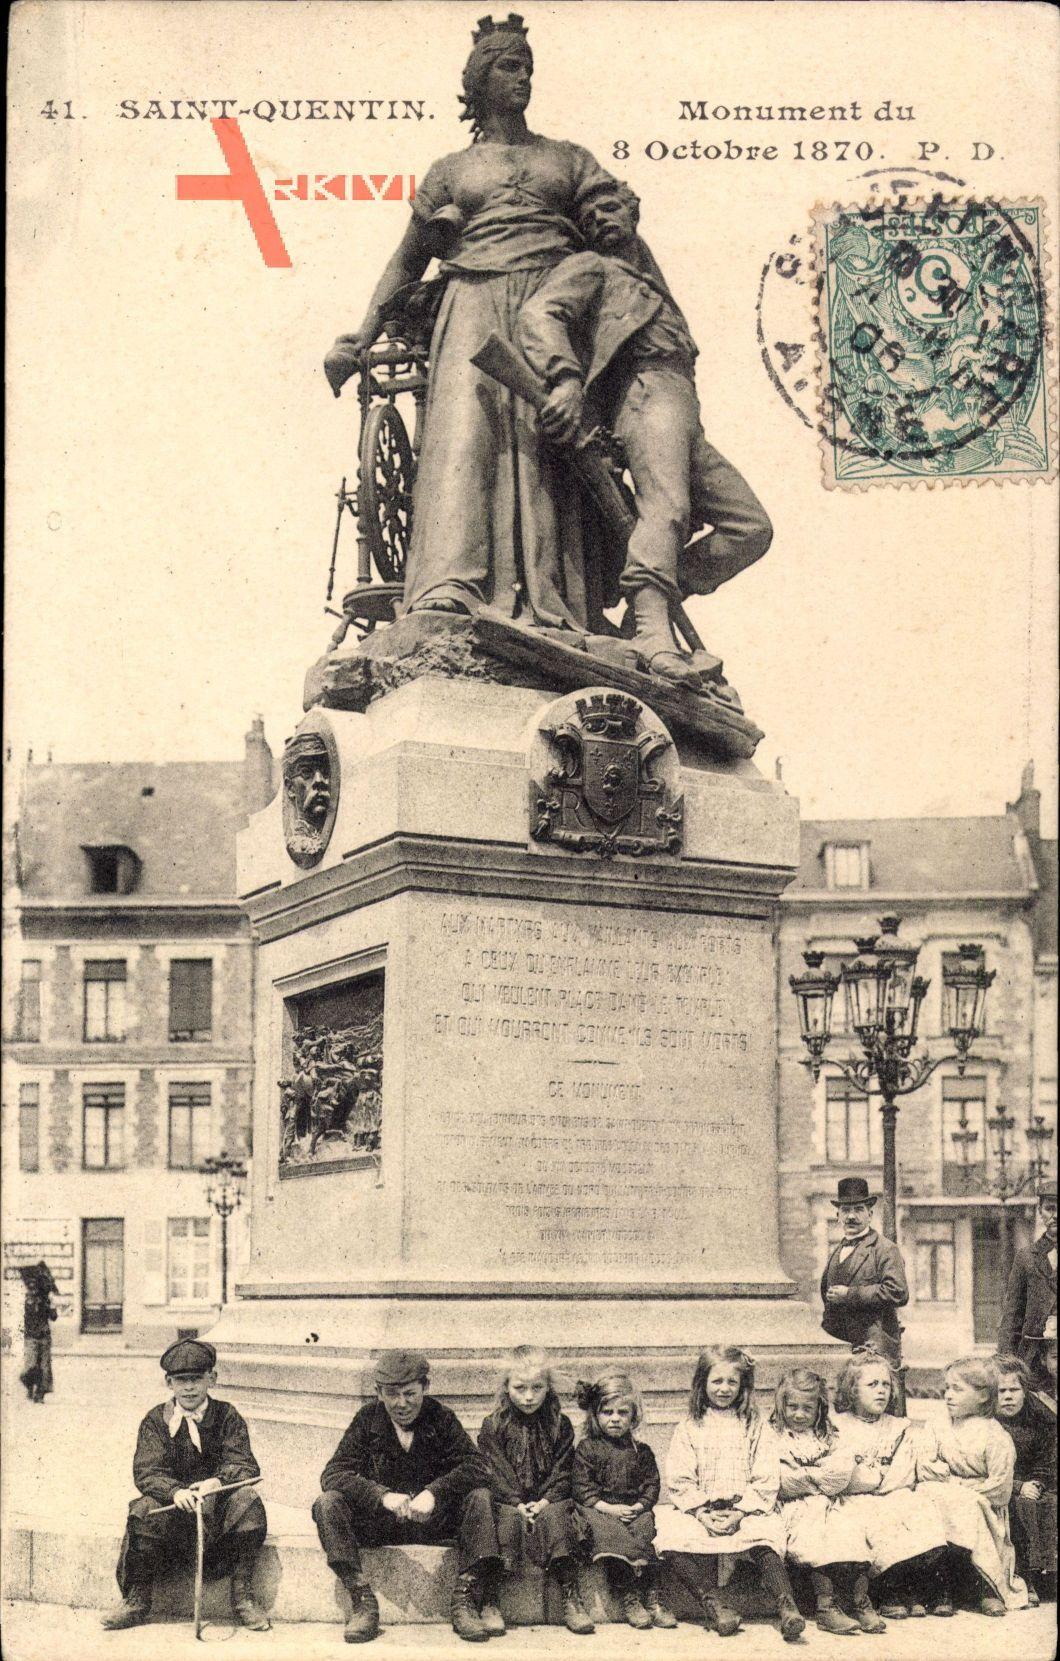 Saint Quentin Aisne, Monument du 8 Octobre 1870, Kinder, Häuser, Straßenlampe